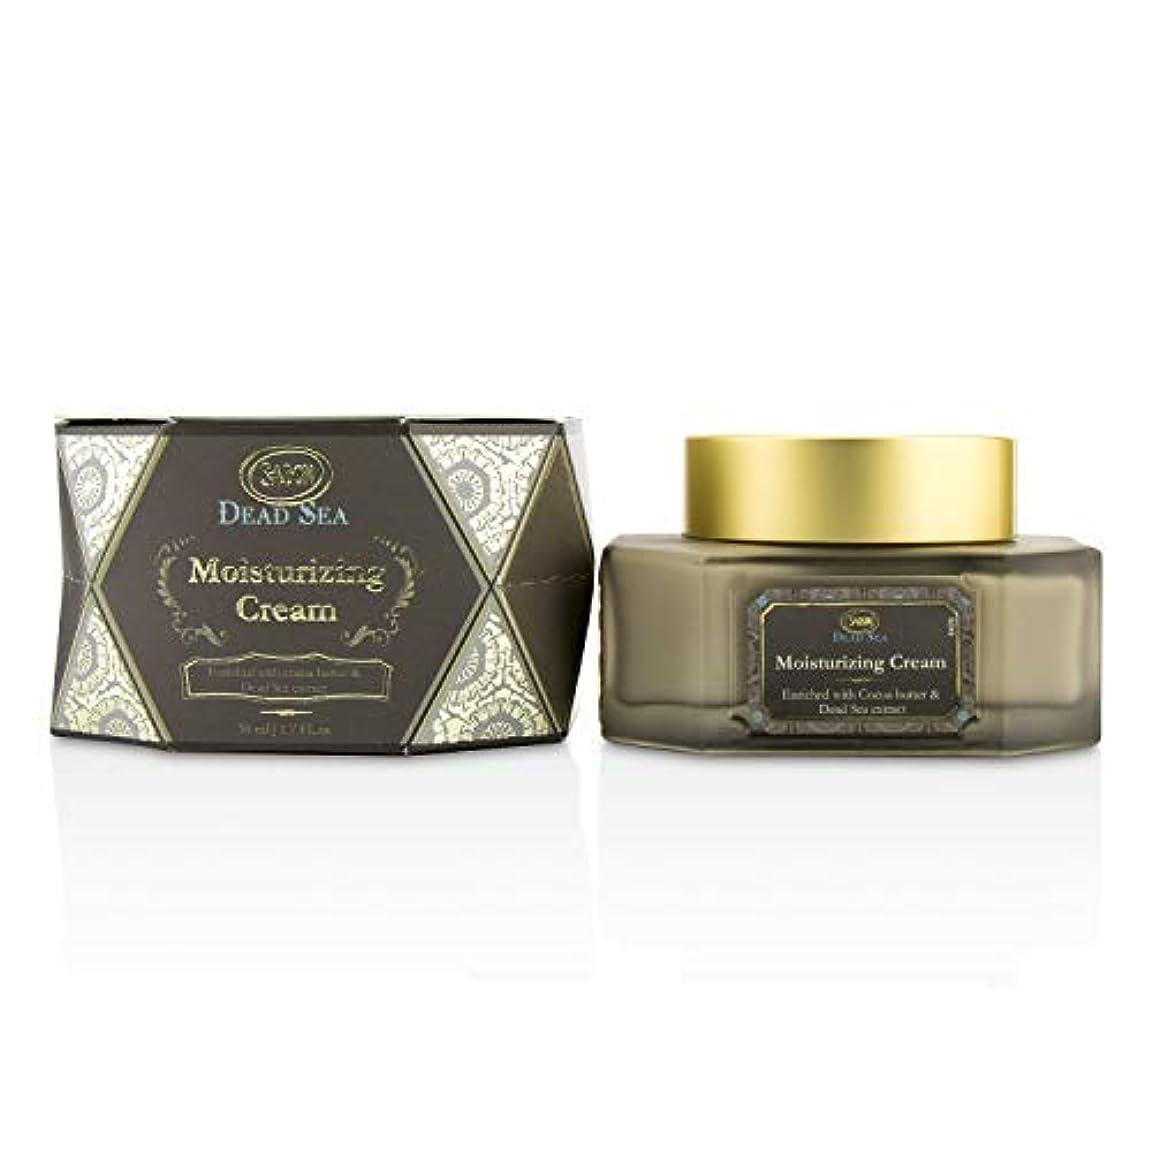 文言合唱団通行料金サボン Dead Sea Moisturizing Cream 50ml/1.7oz並行輸入品